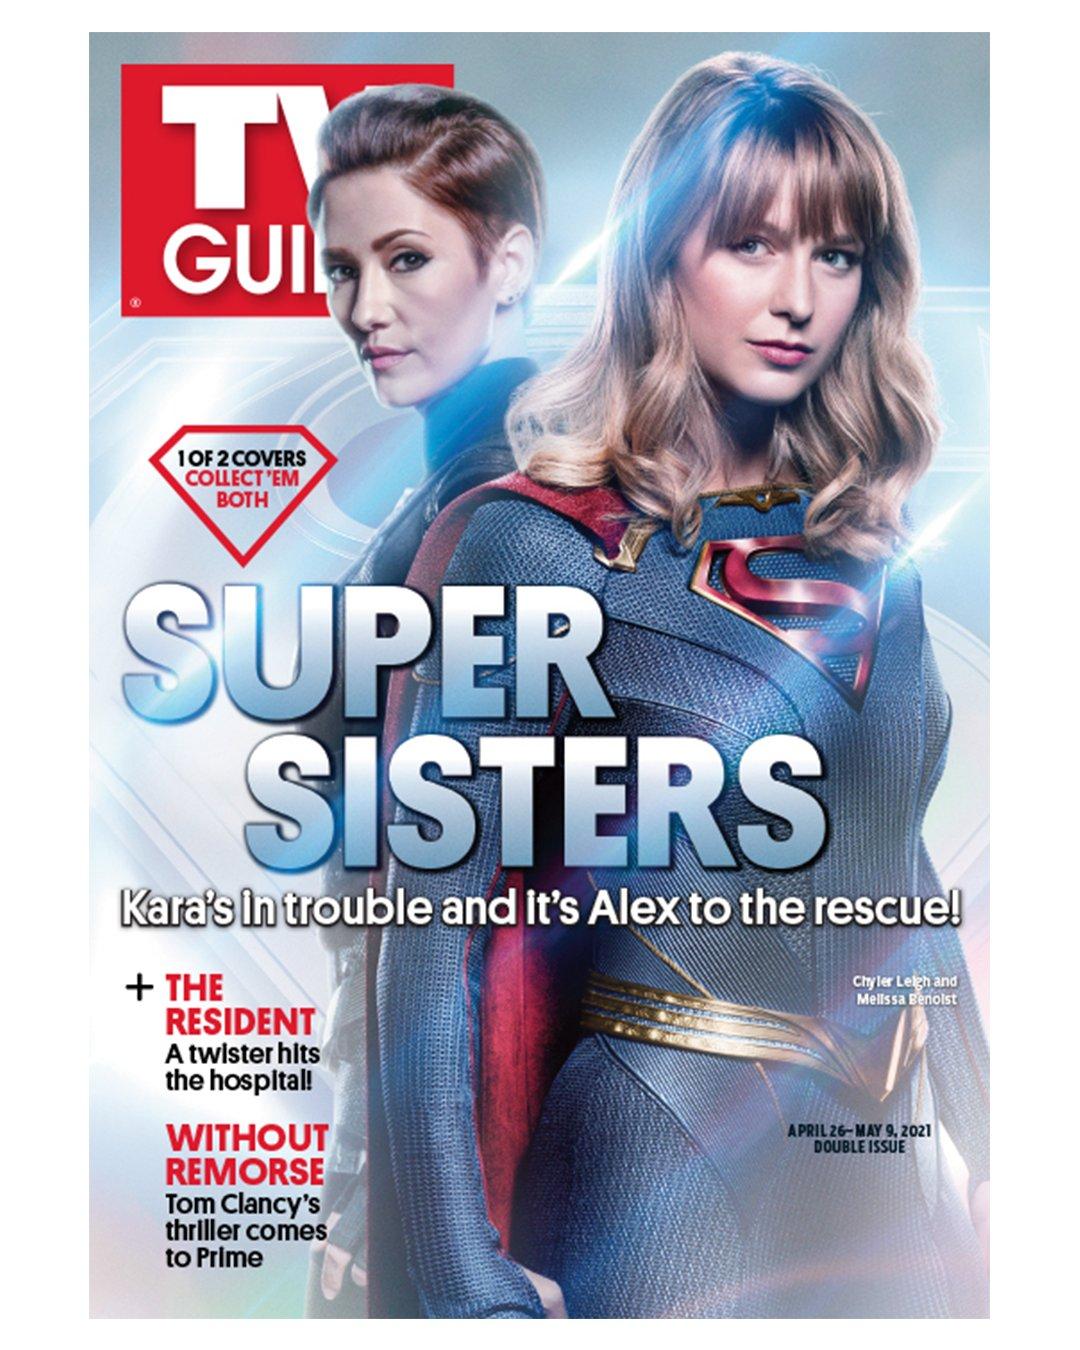 https://www.supermanhomepage.com/clickandbuilds/SupermanHomepage/wp-content/uploads/2021/04/TVGuide-Supergirl2021a.jpeg